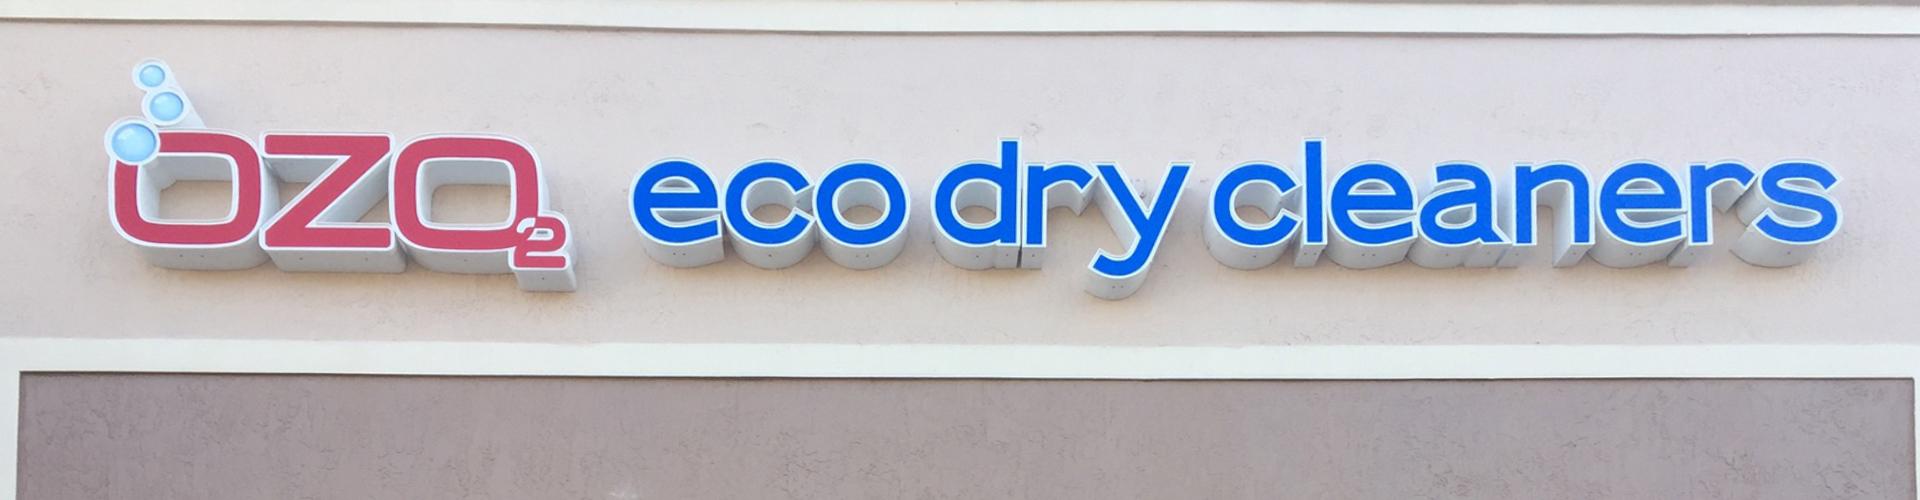 OZO2 Eco Dry Cleaners - North Palm Beach, FL